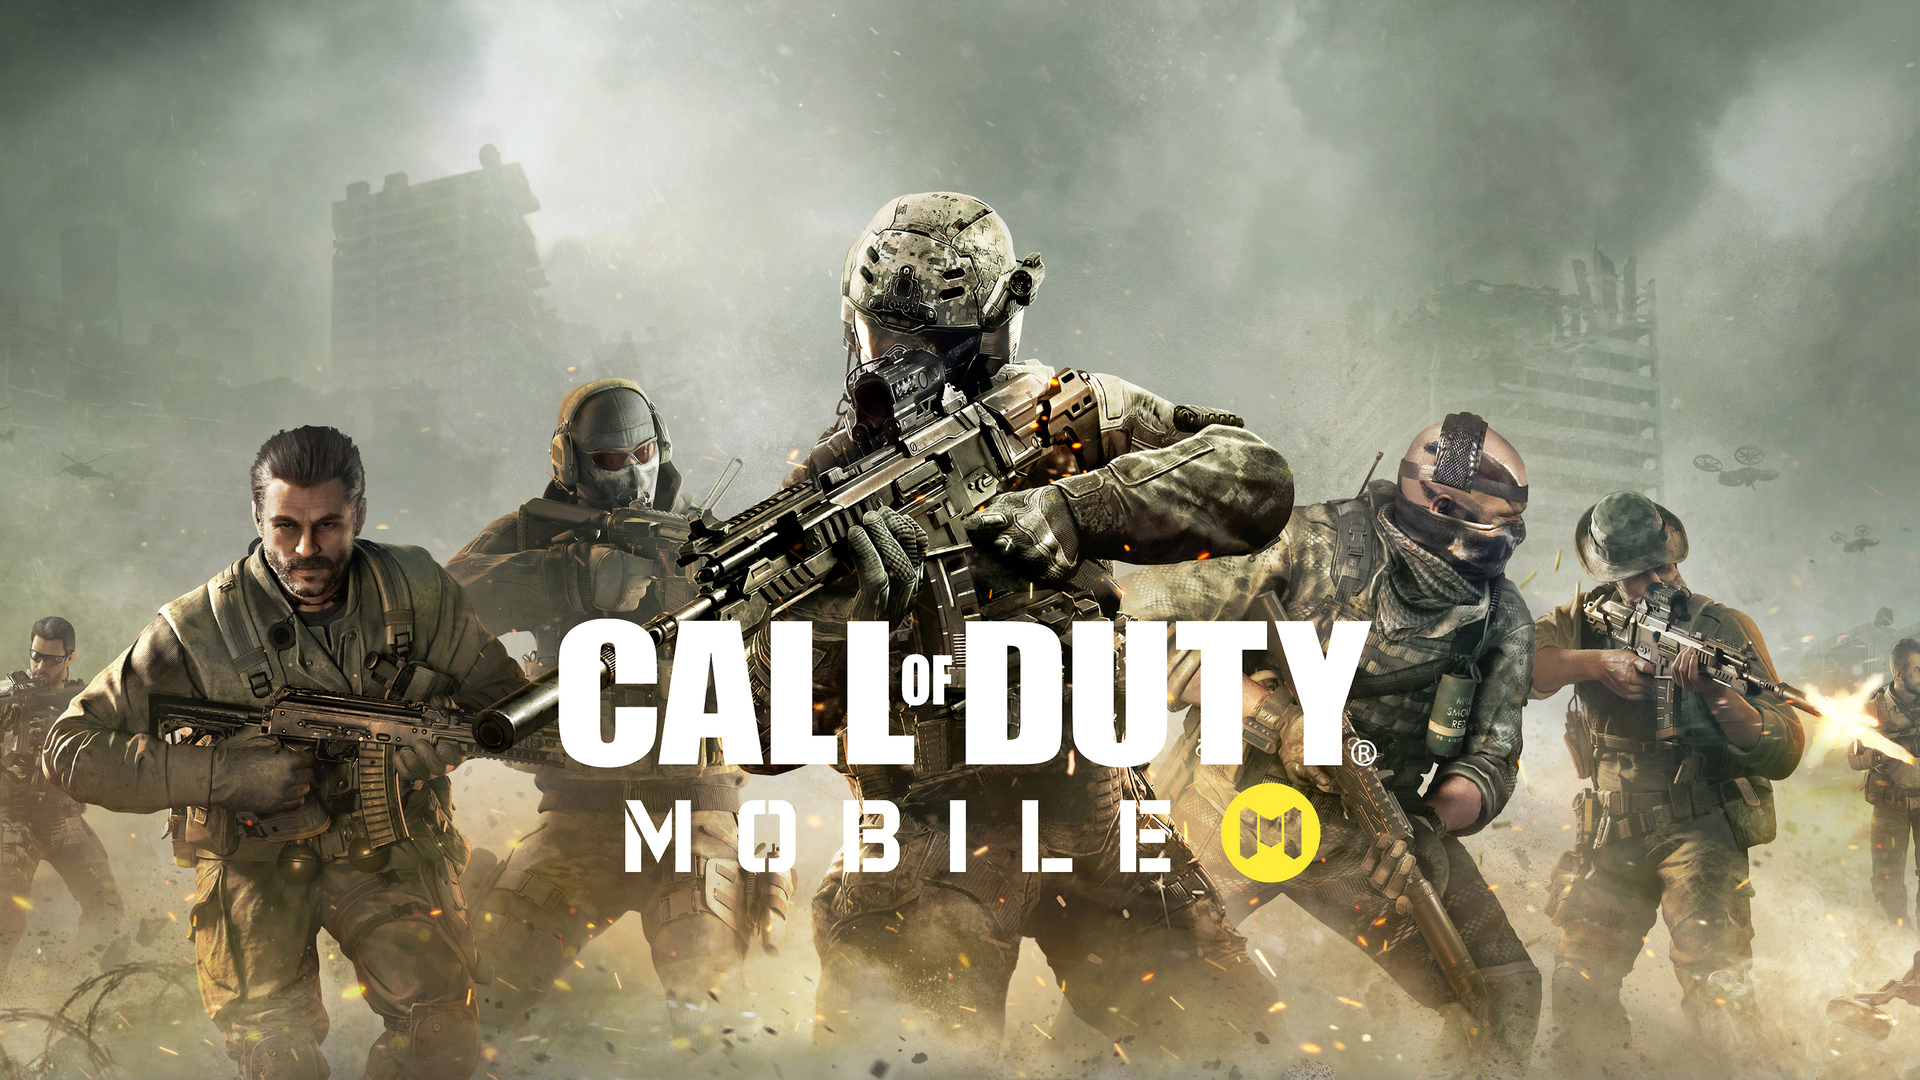 1920x1080 Call Of Duty Mobile Laptop Full HD 1080P HD 4k ...